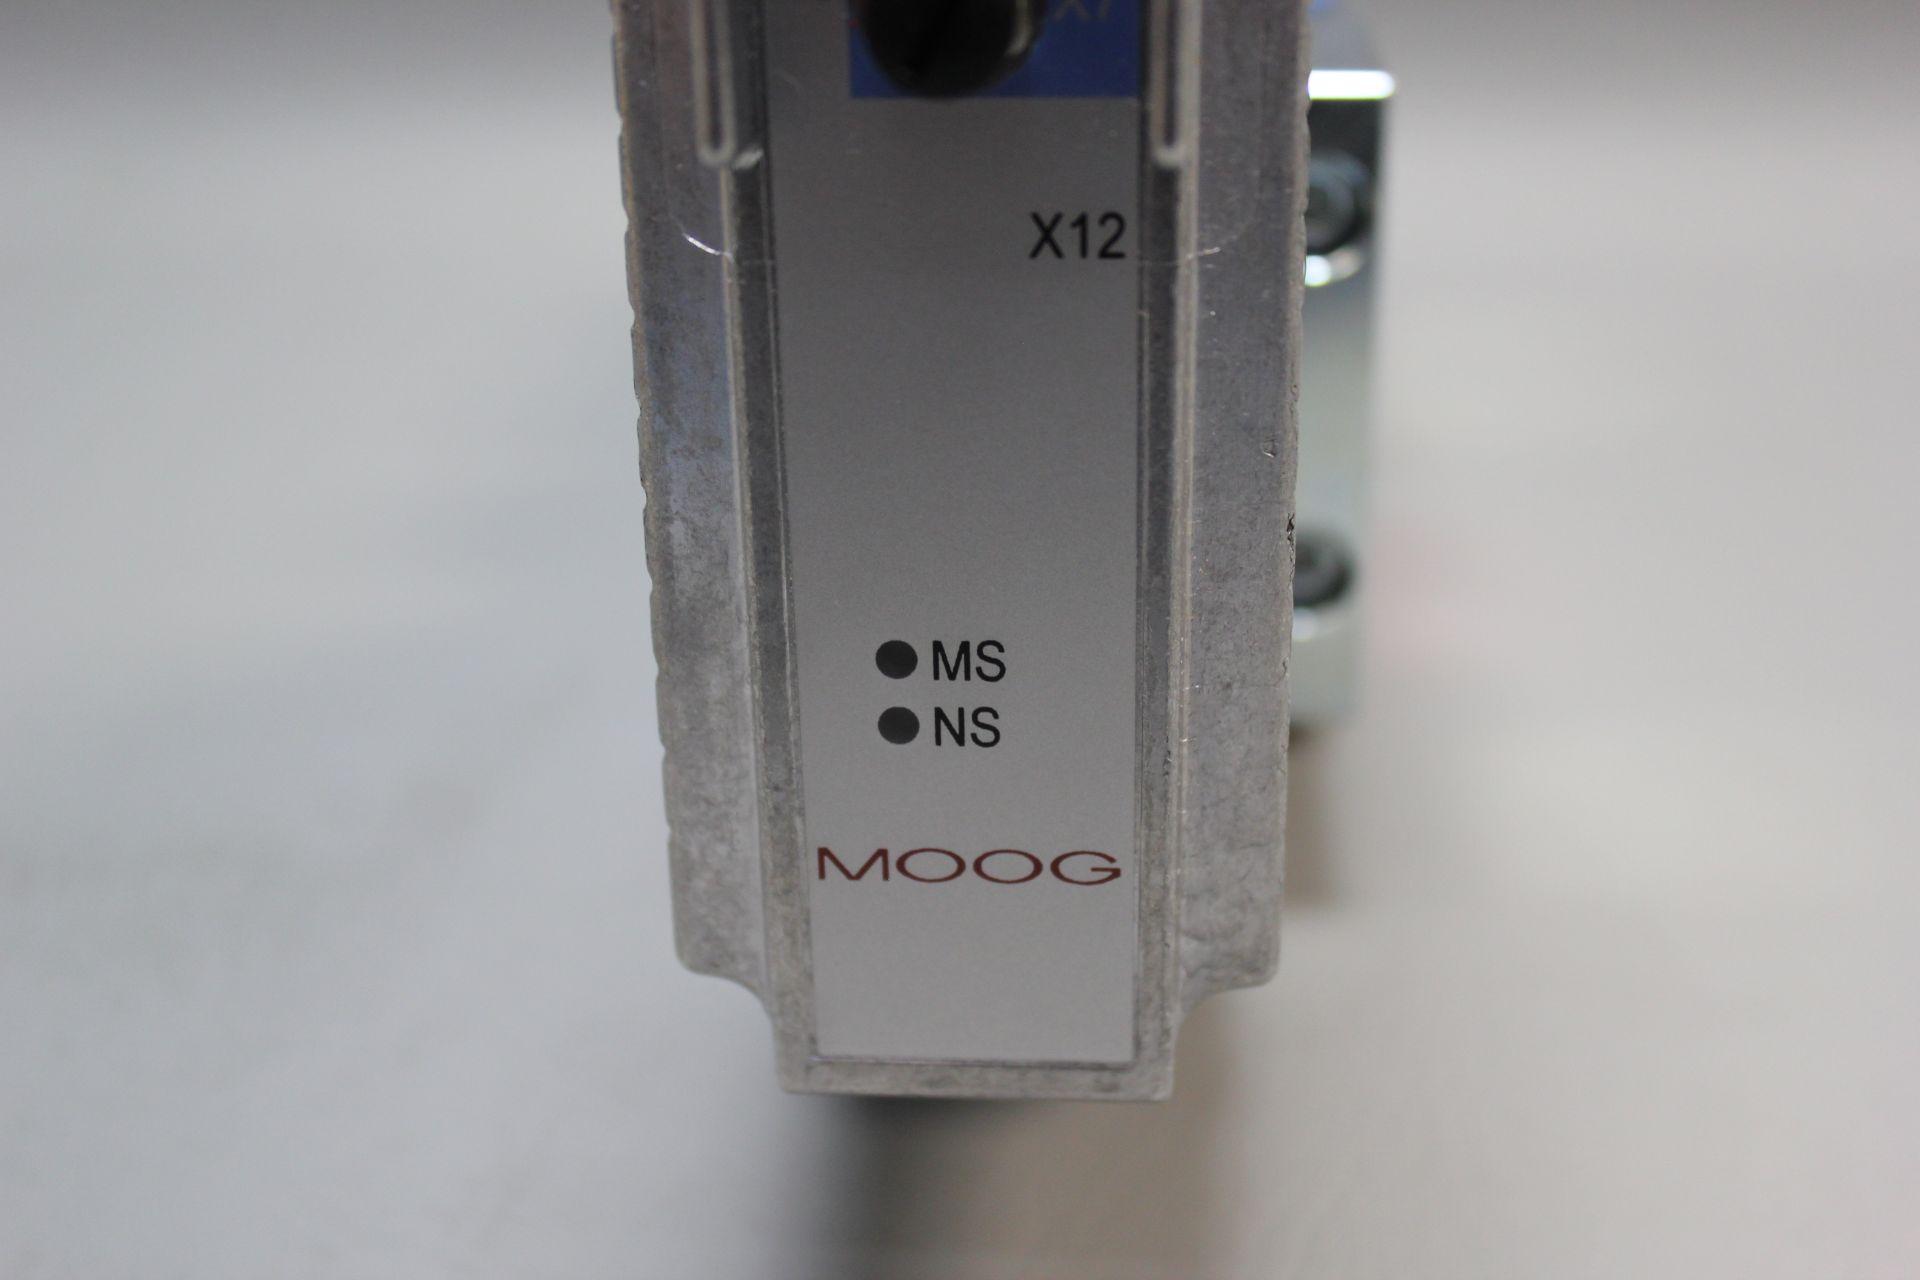 NEW MOOG DIRECT DRIVE DIGITAL CONTROL HYDRAULIC SERVO VALVE - Image 11 of 15